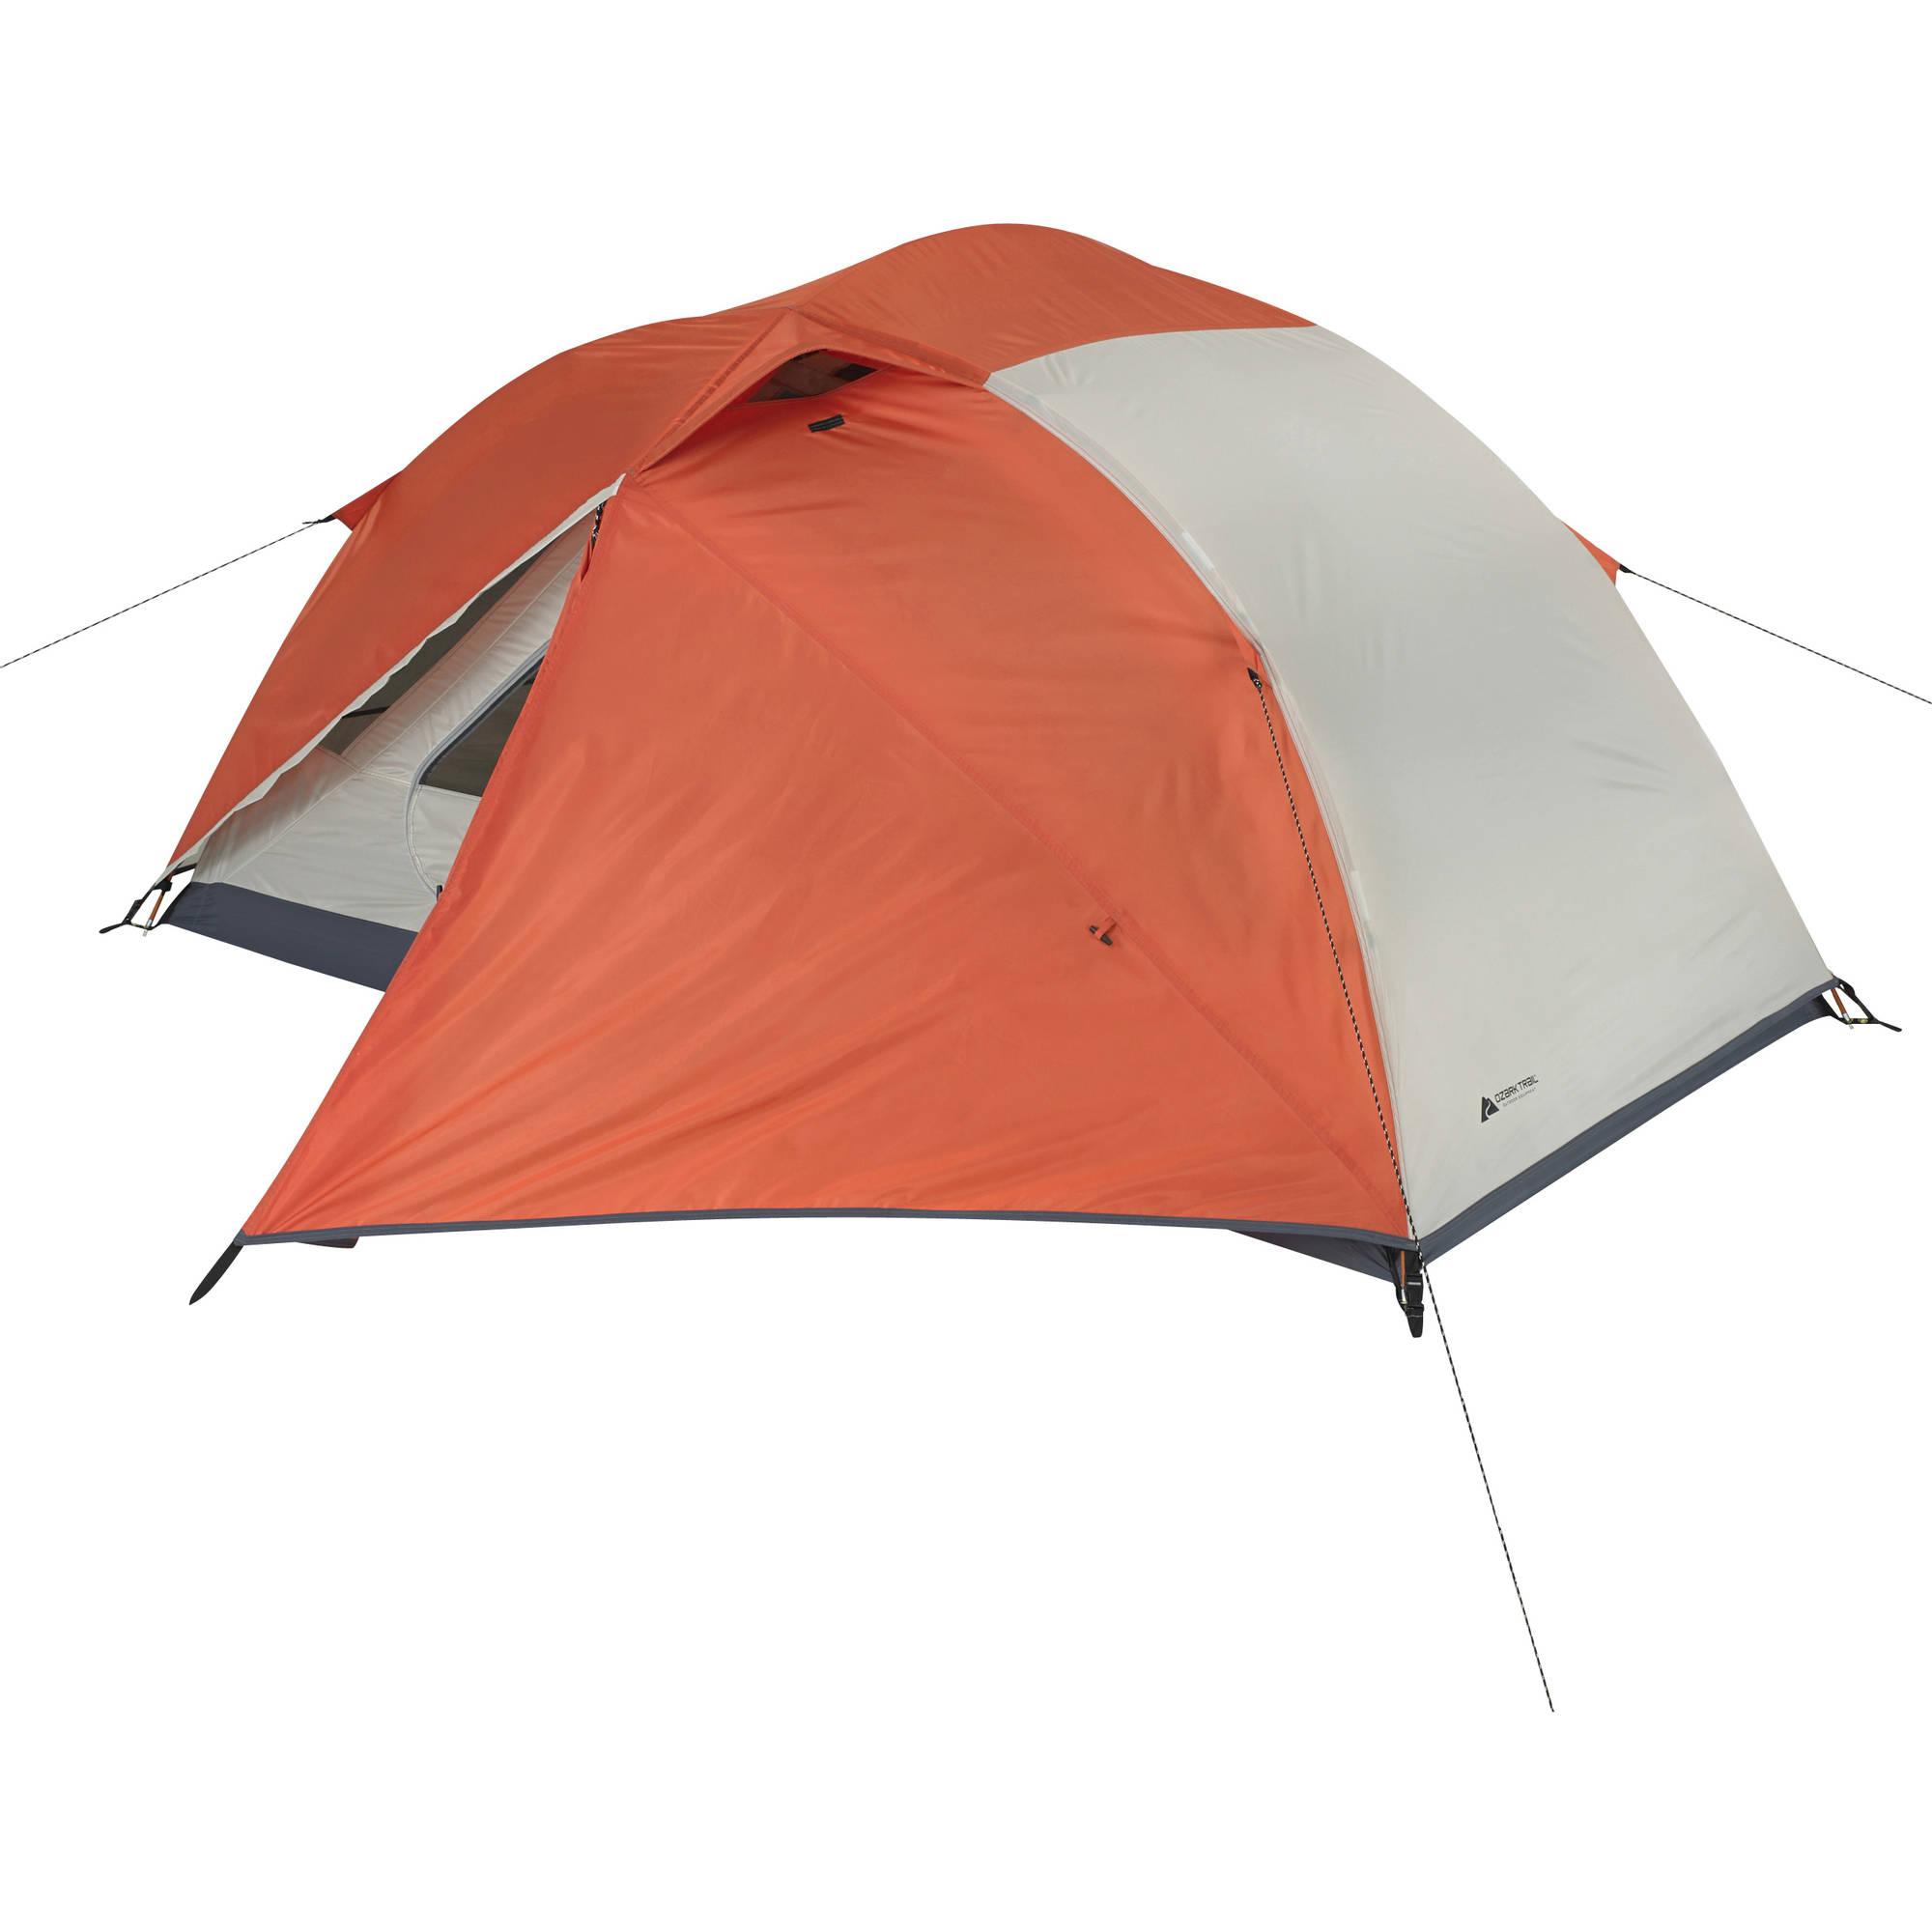 225 & Ozark Trail 4-Season 2-Person Hiker Tent. | Onsales19.com